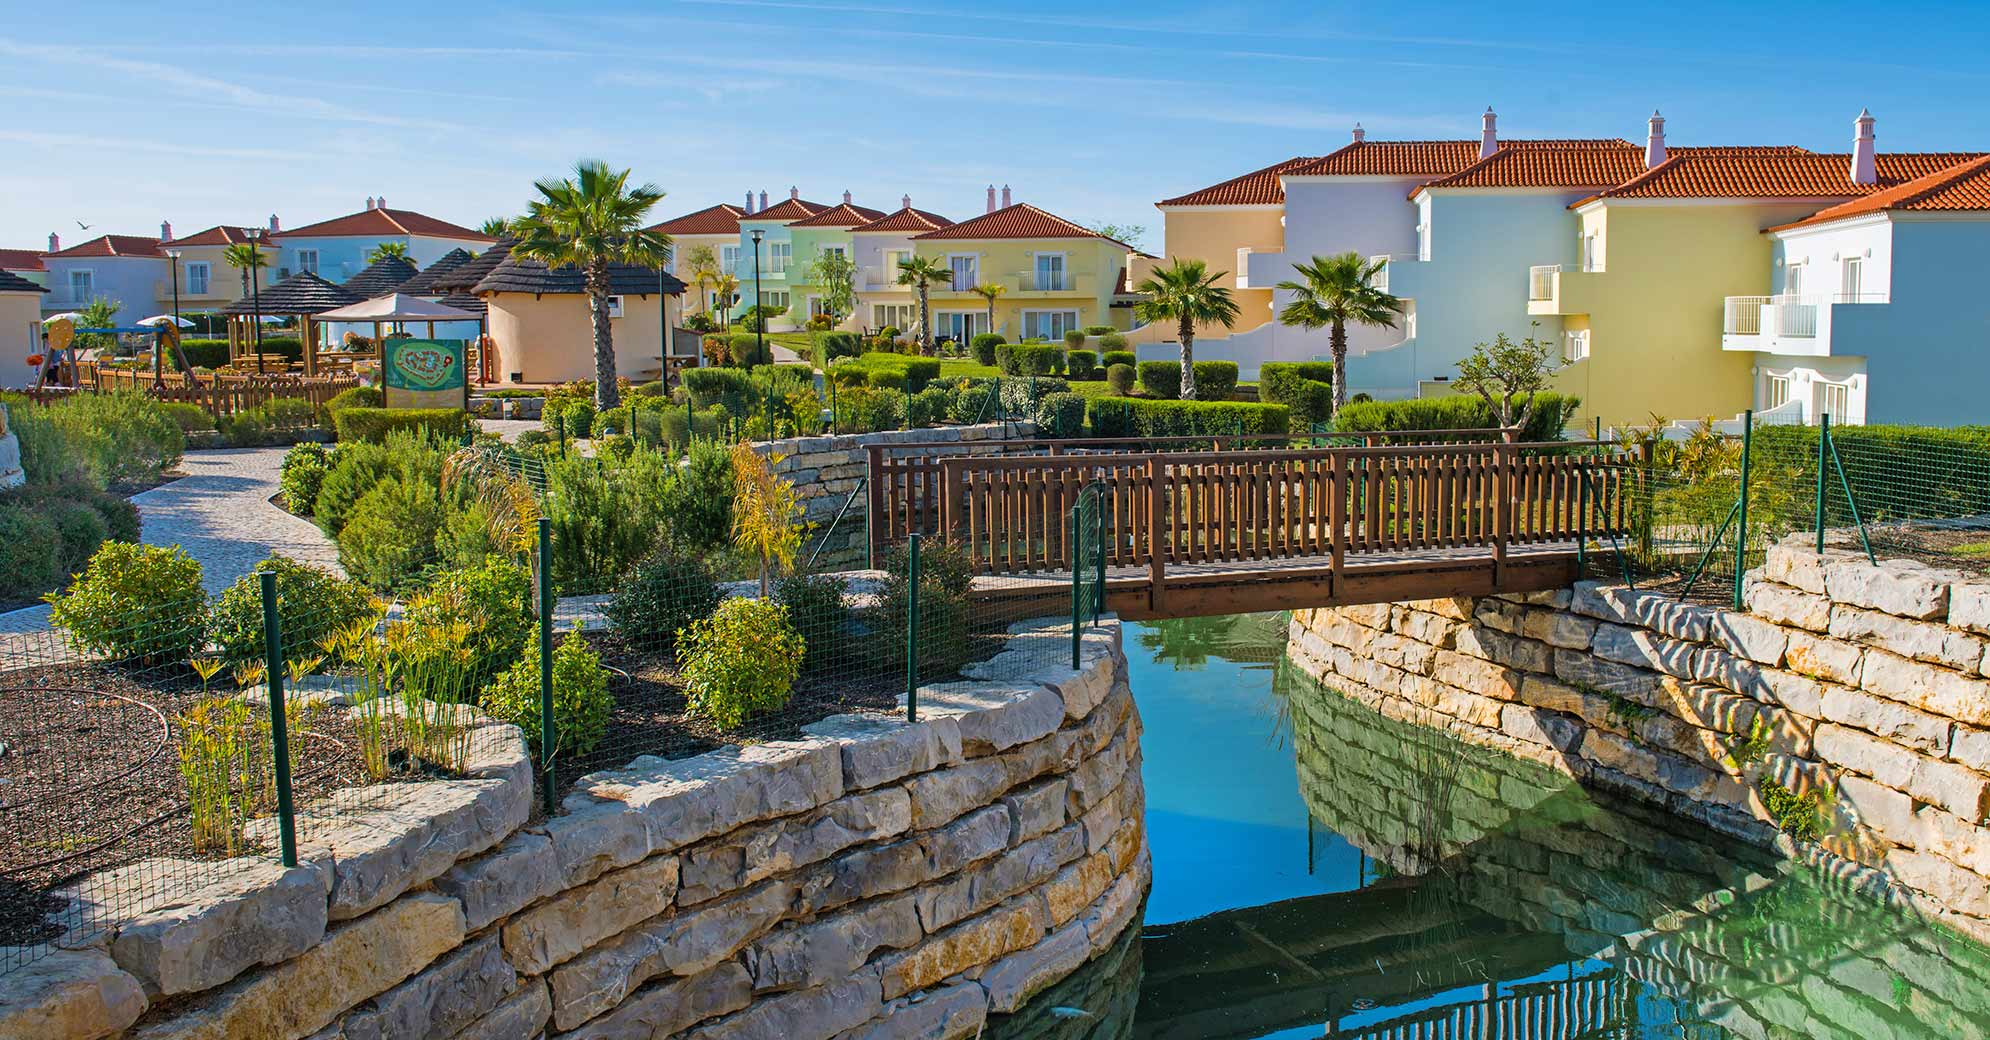 Eden Resort Hotel Albufeira